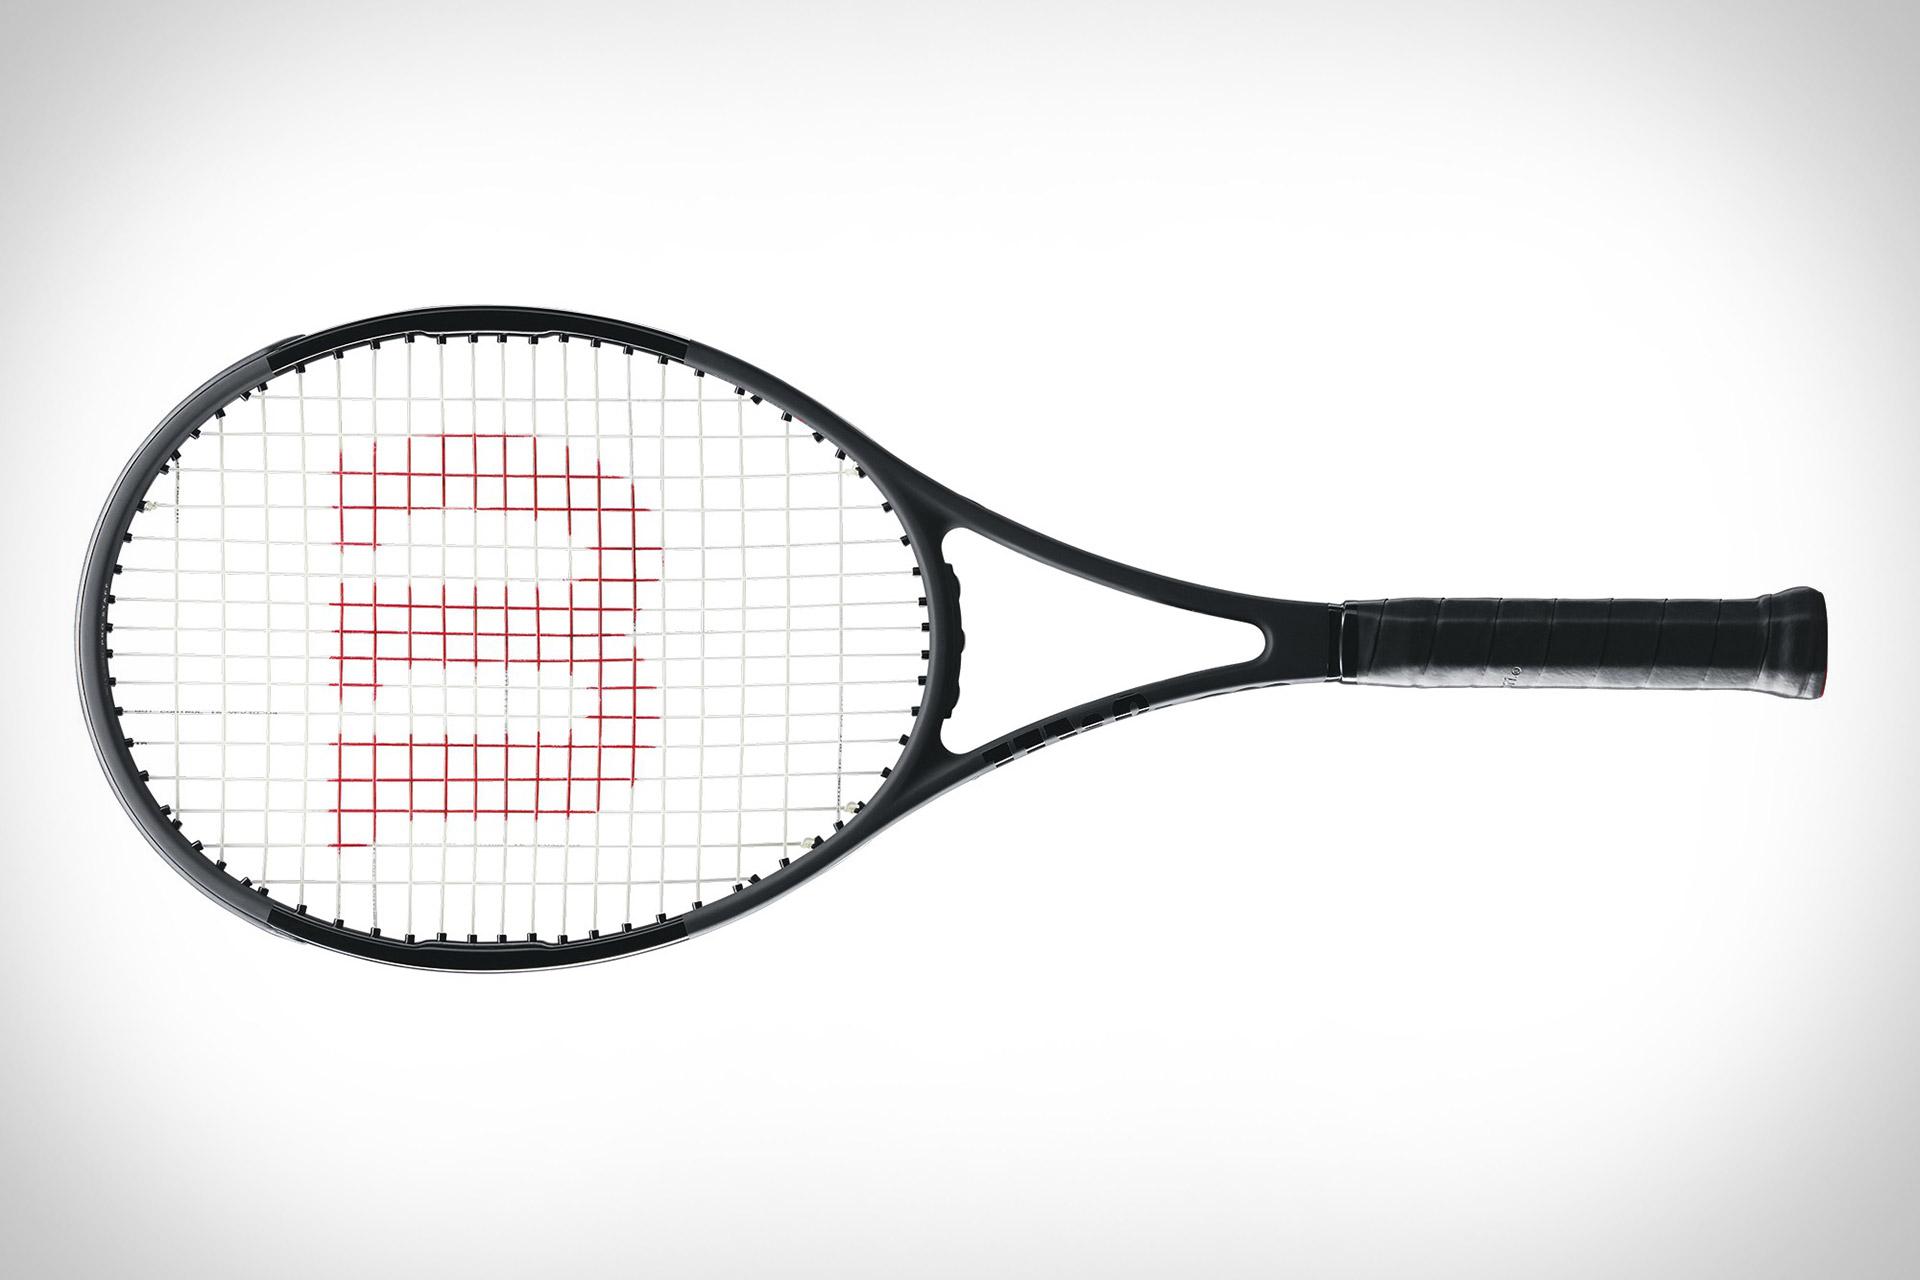 Wilson Pro Staff 97 CV Tennis Racket